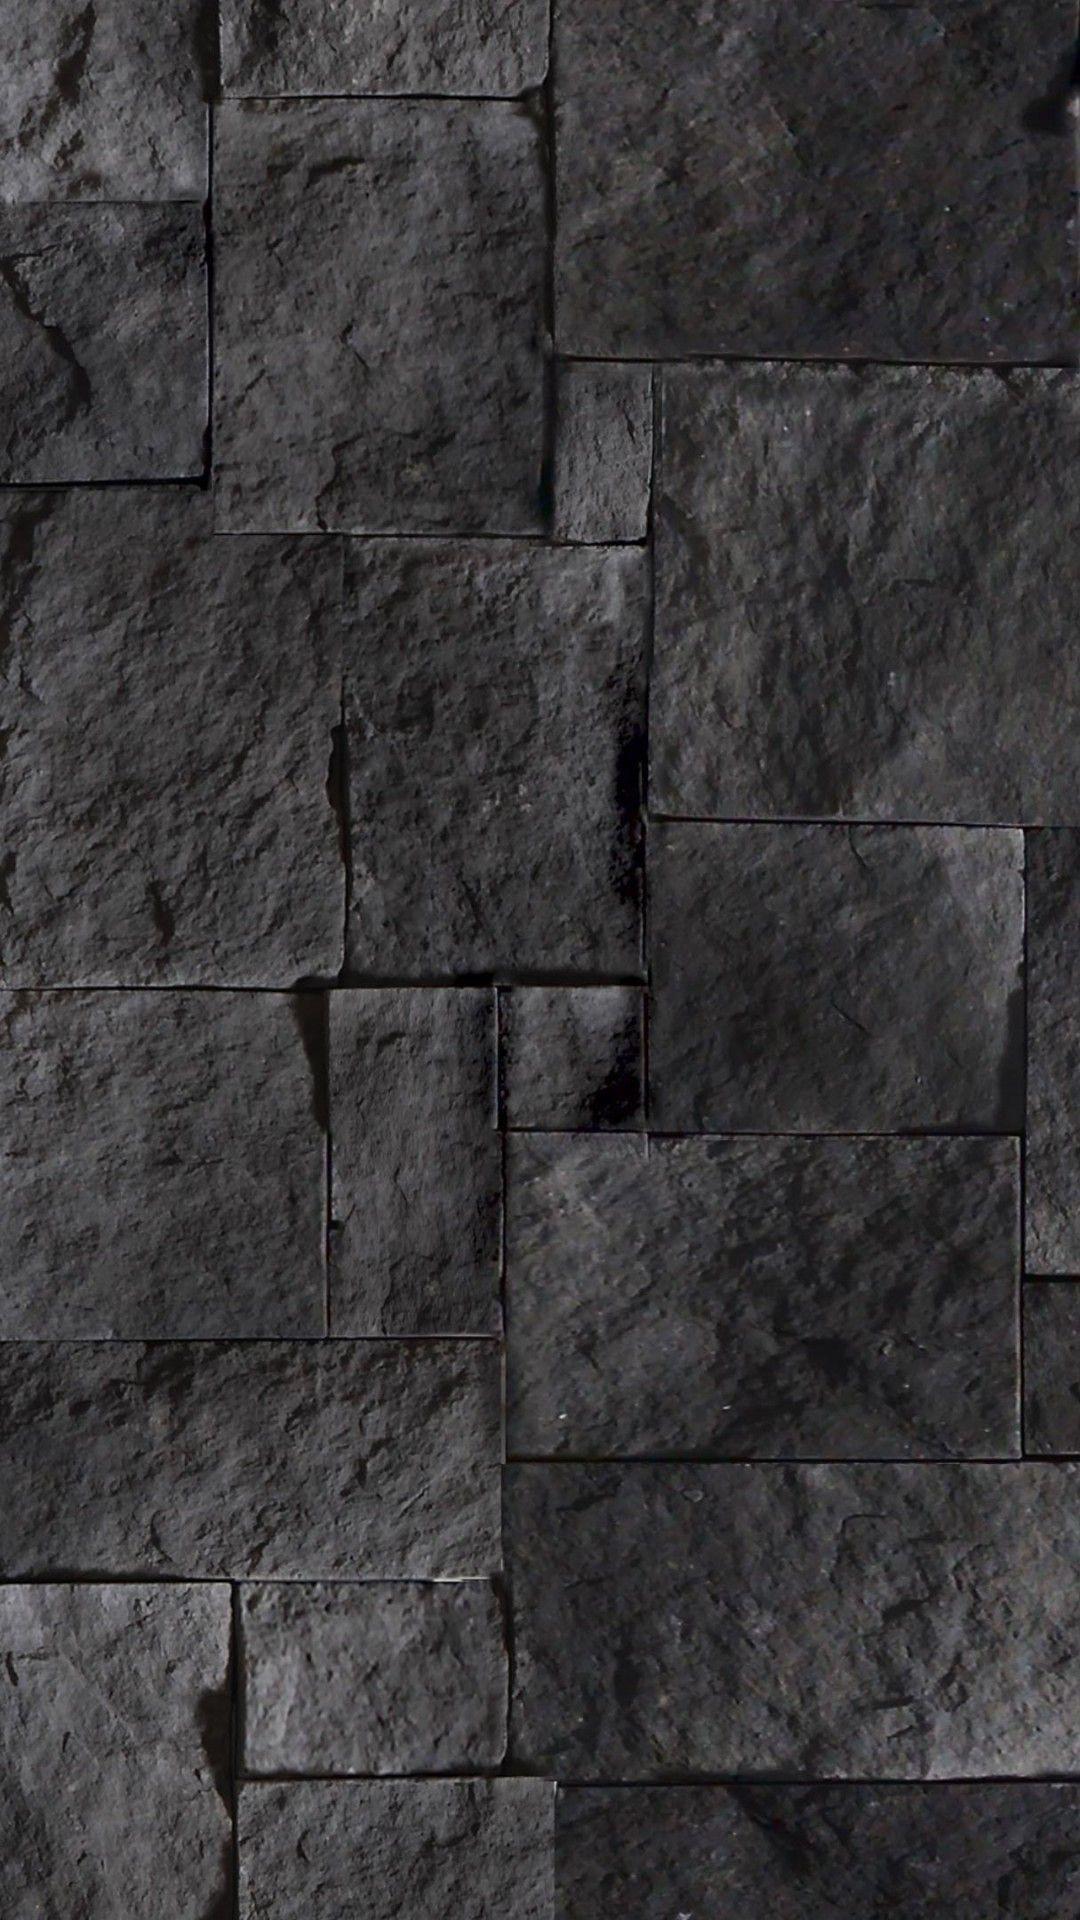 Black Brick Iphone Background > Flip Wallpapers > Download